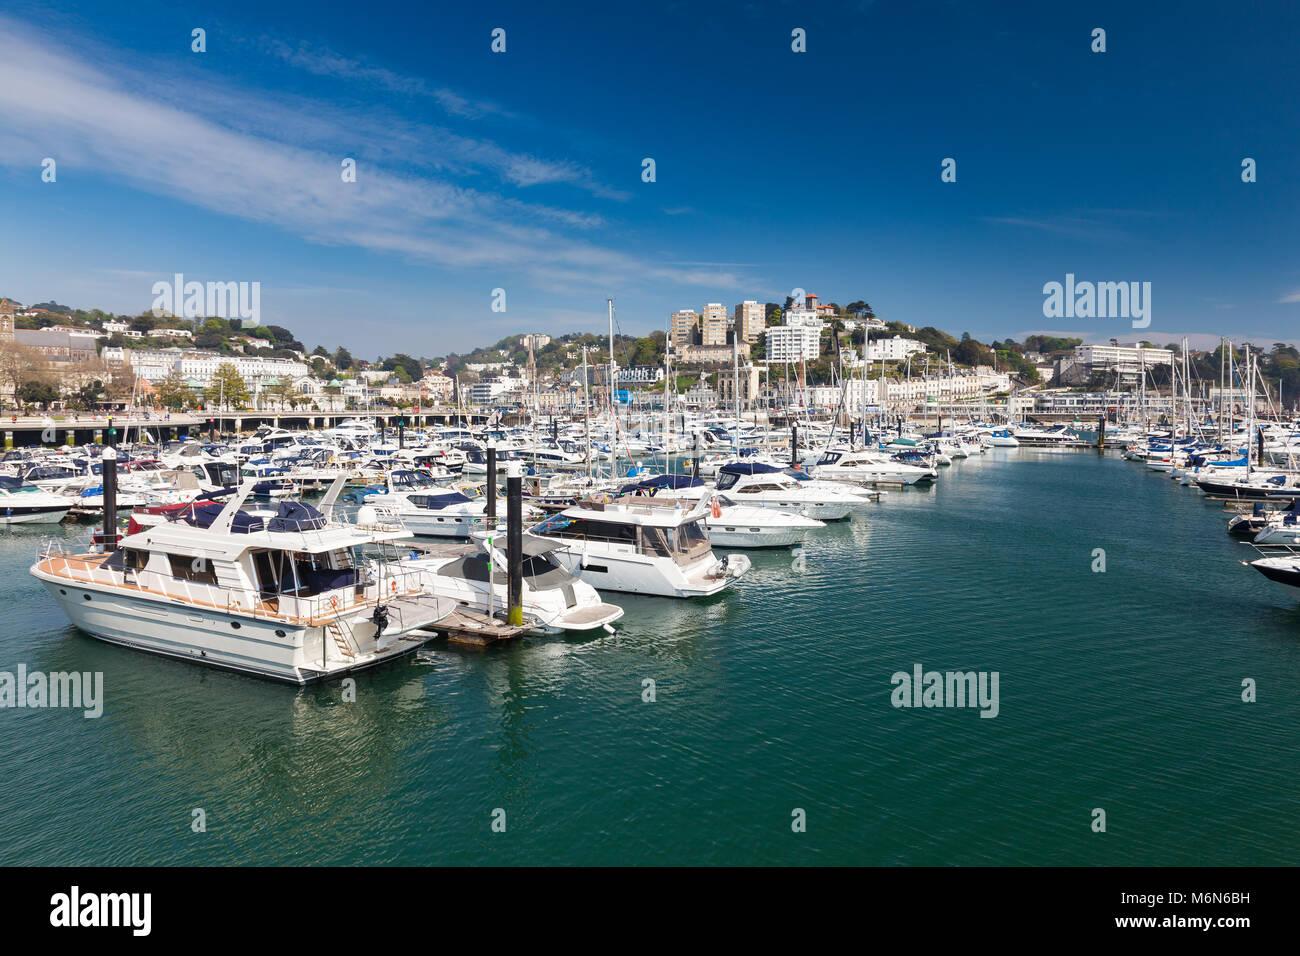 TORQUAY, UNITED KINGDOM - 7th of May 2016 - Summer at Torquay Harbour & Marina Devon England UK a popular tourist Stock Photo